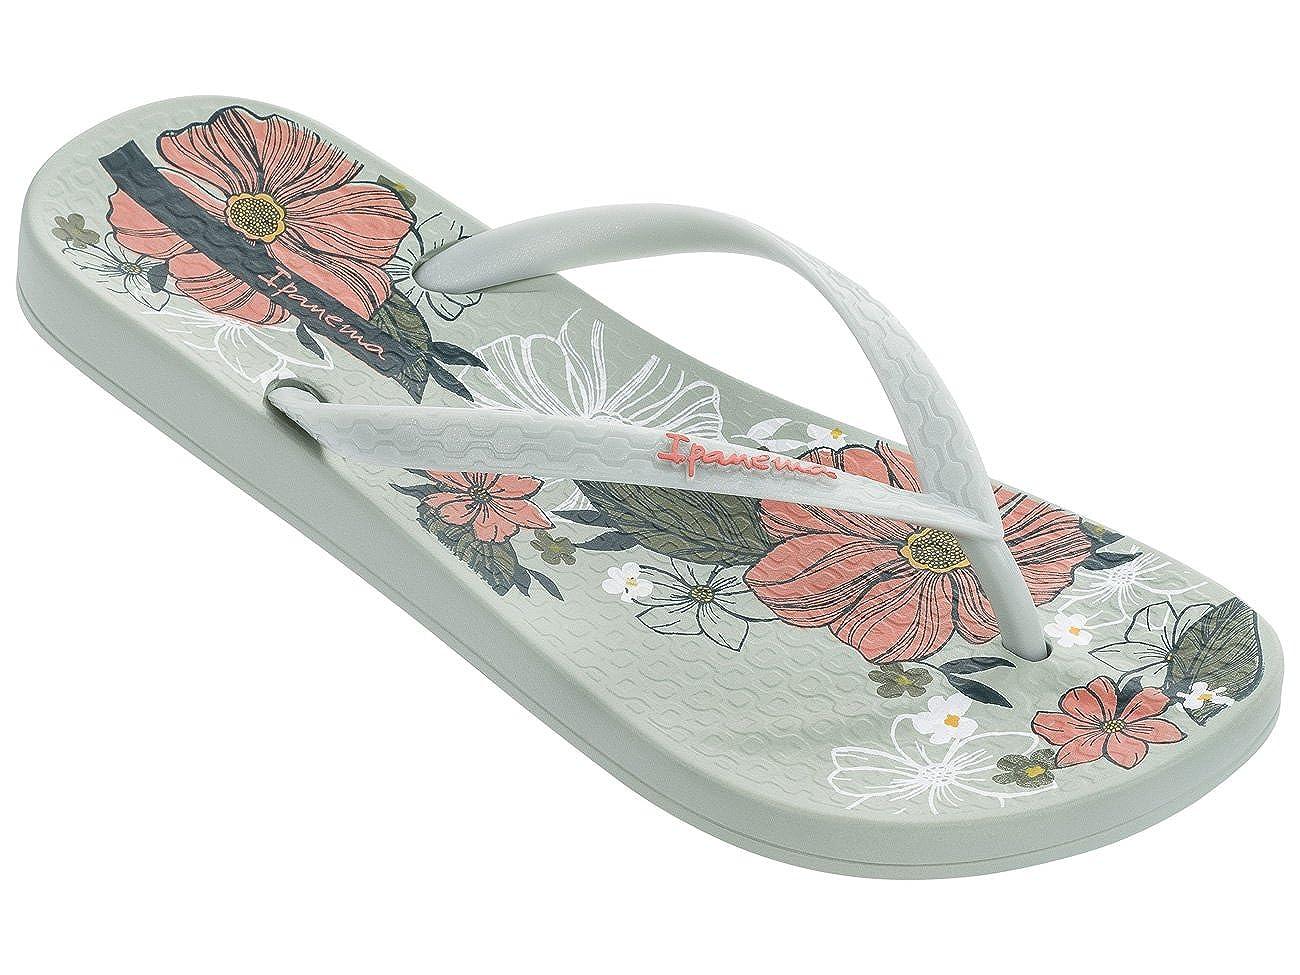 Ipanema Womens Petal Flip Flops Patterned Footbed